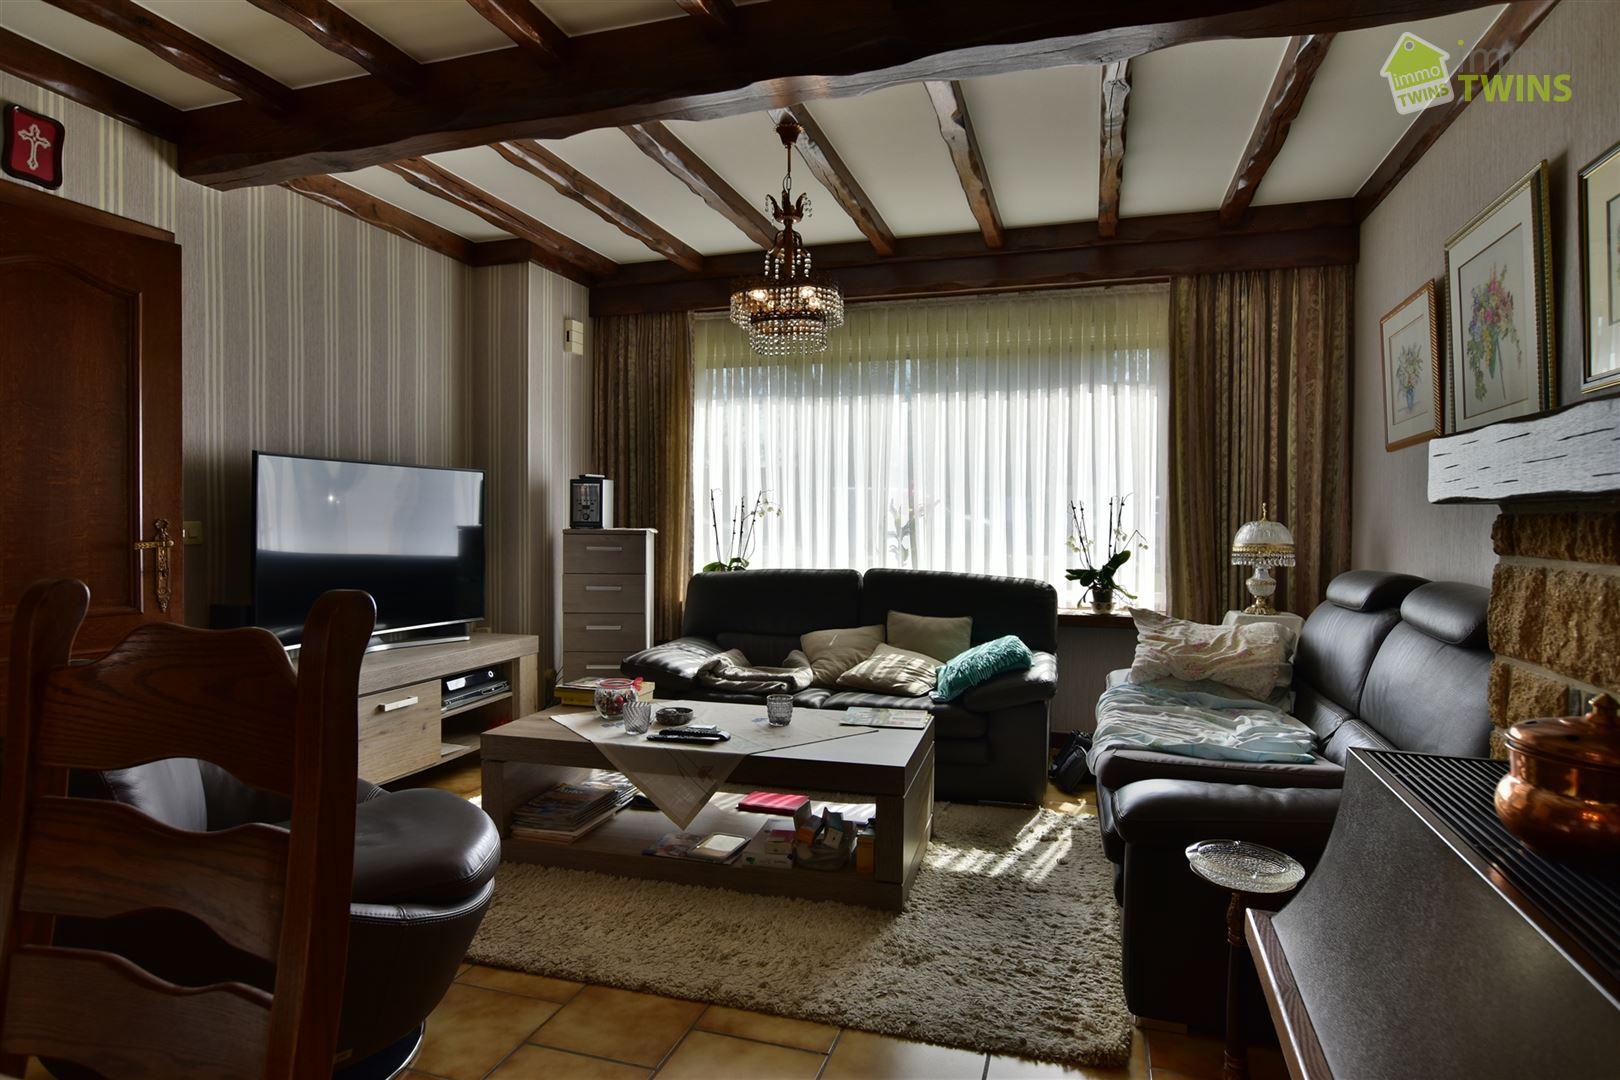 Foto 4 : Woning te 9200 SINT-GILLIS-BIJ-DENDERMONDE (België) - Prijs € 195.000